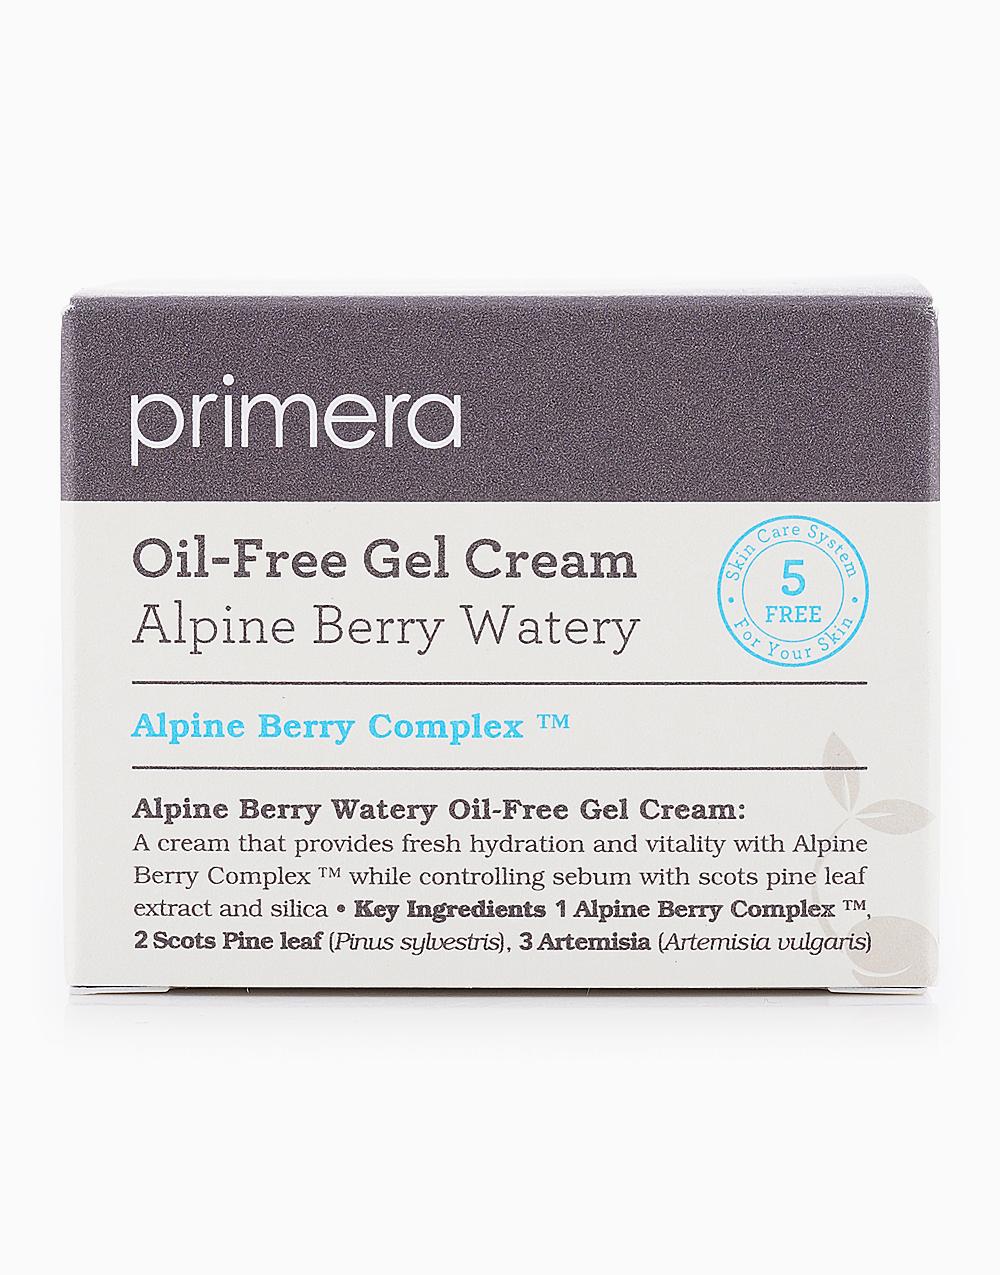 Alpine Berry Watery Oil-Free Gel Cream (50ml) by Primera